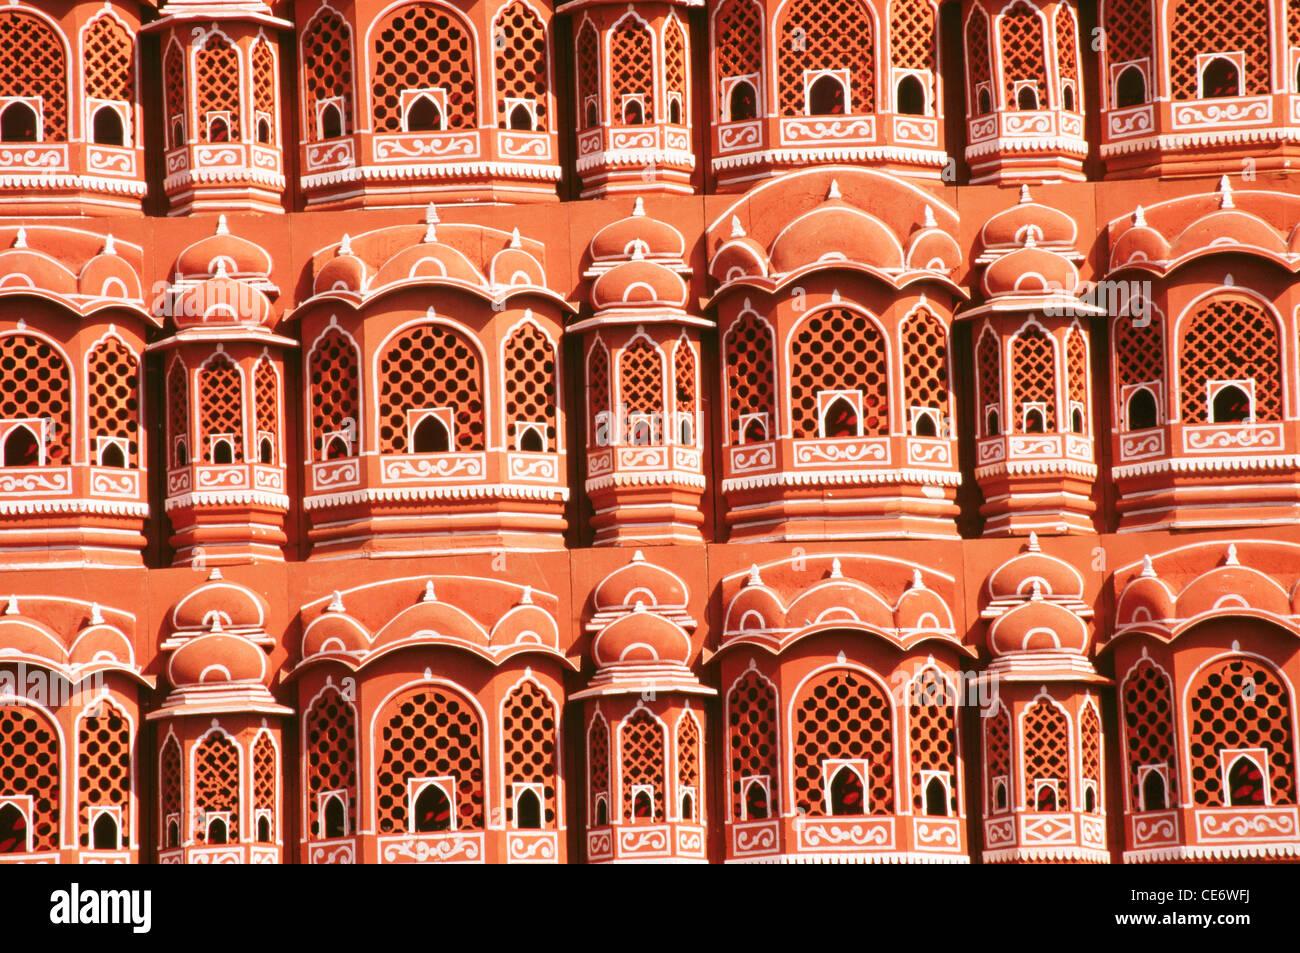 BDR 83400 Hawa Mahal Palace Of Wind Windows Balconies Jaipur Rajasthan India